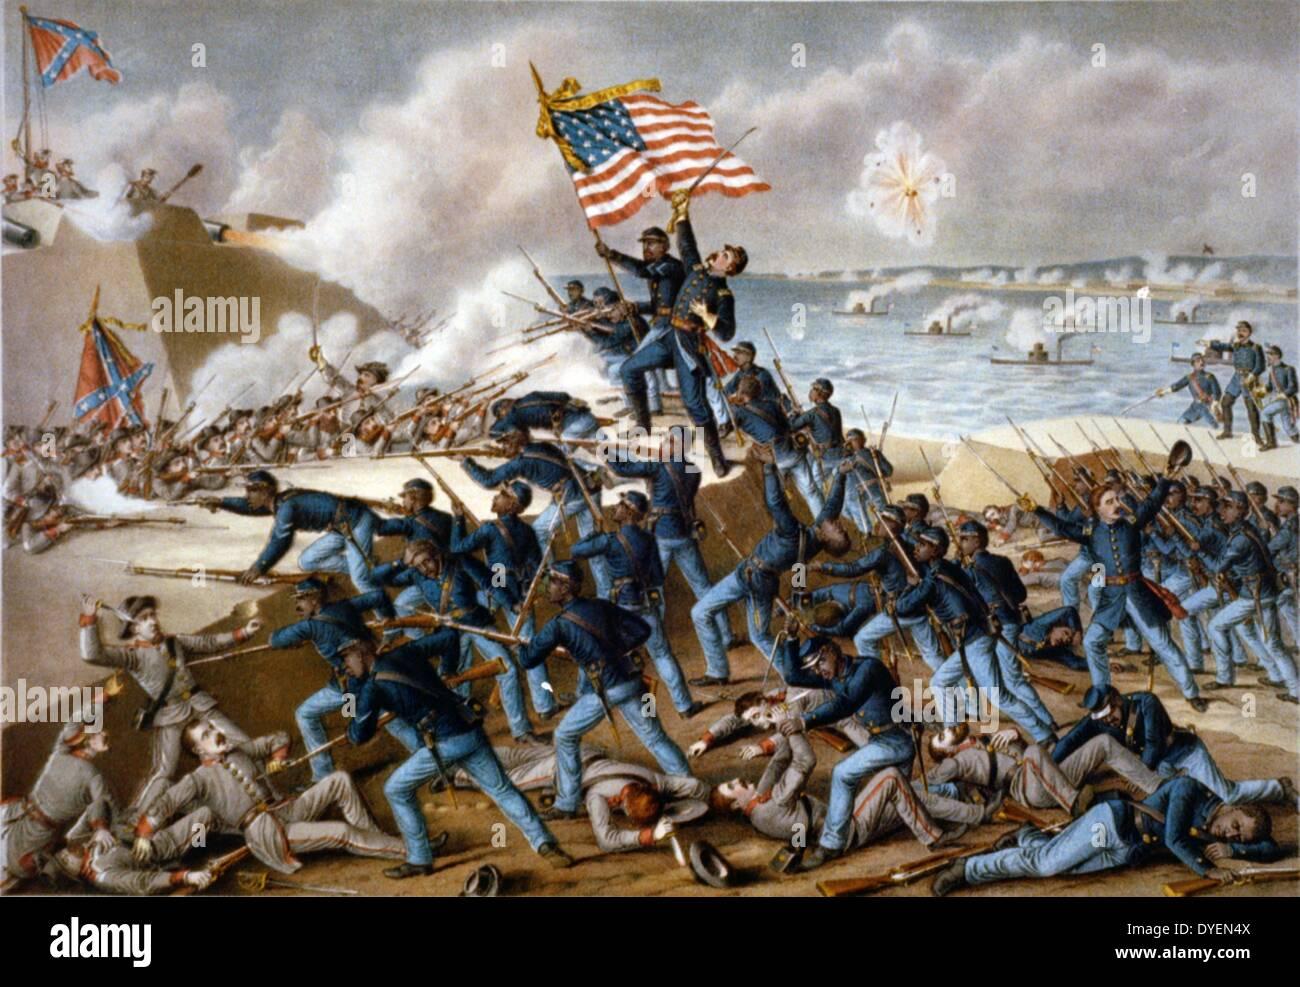 Storming Fort Wagner, American civil war - Stock Image